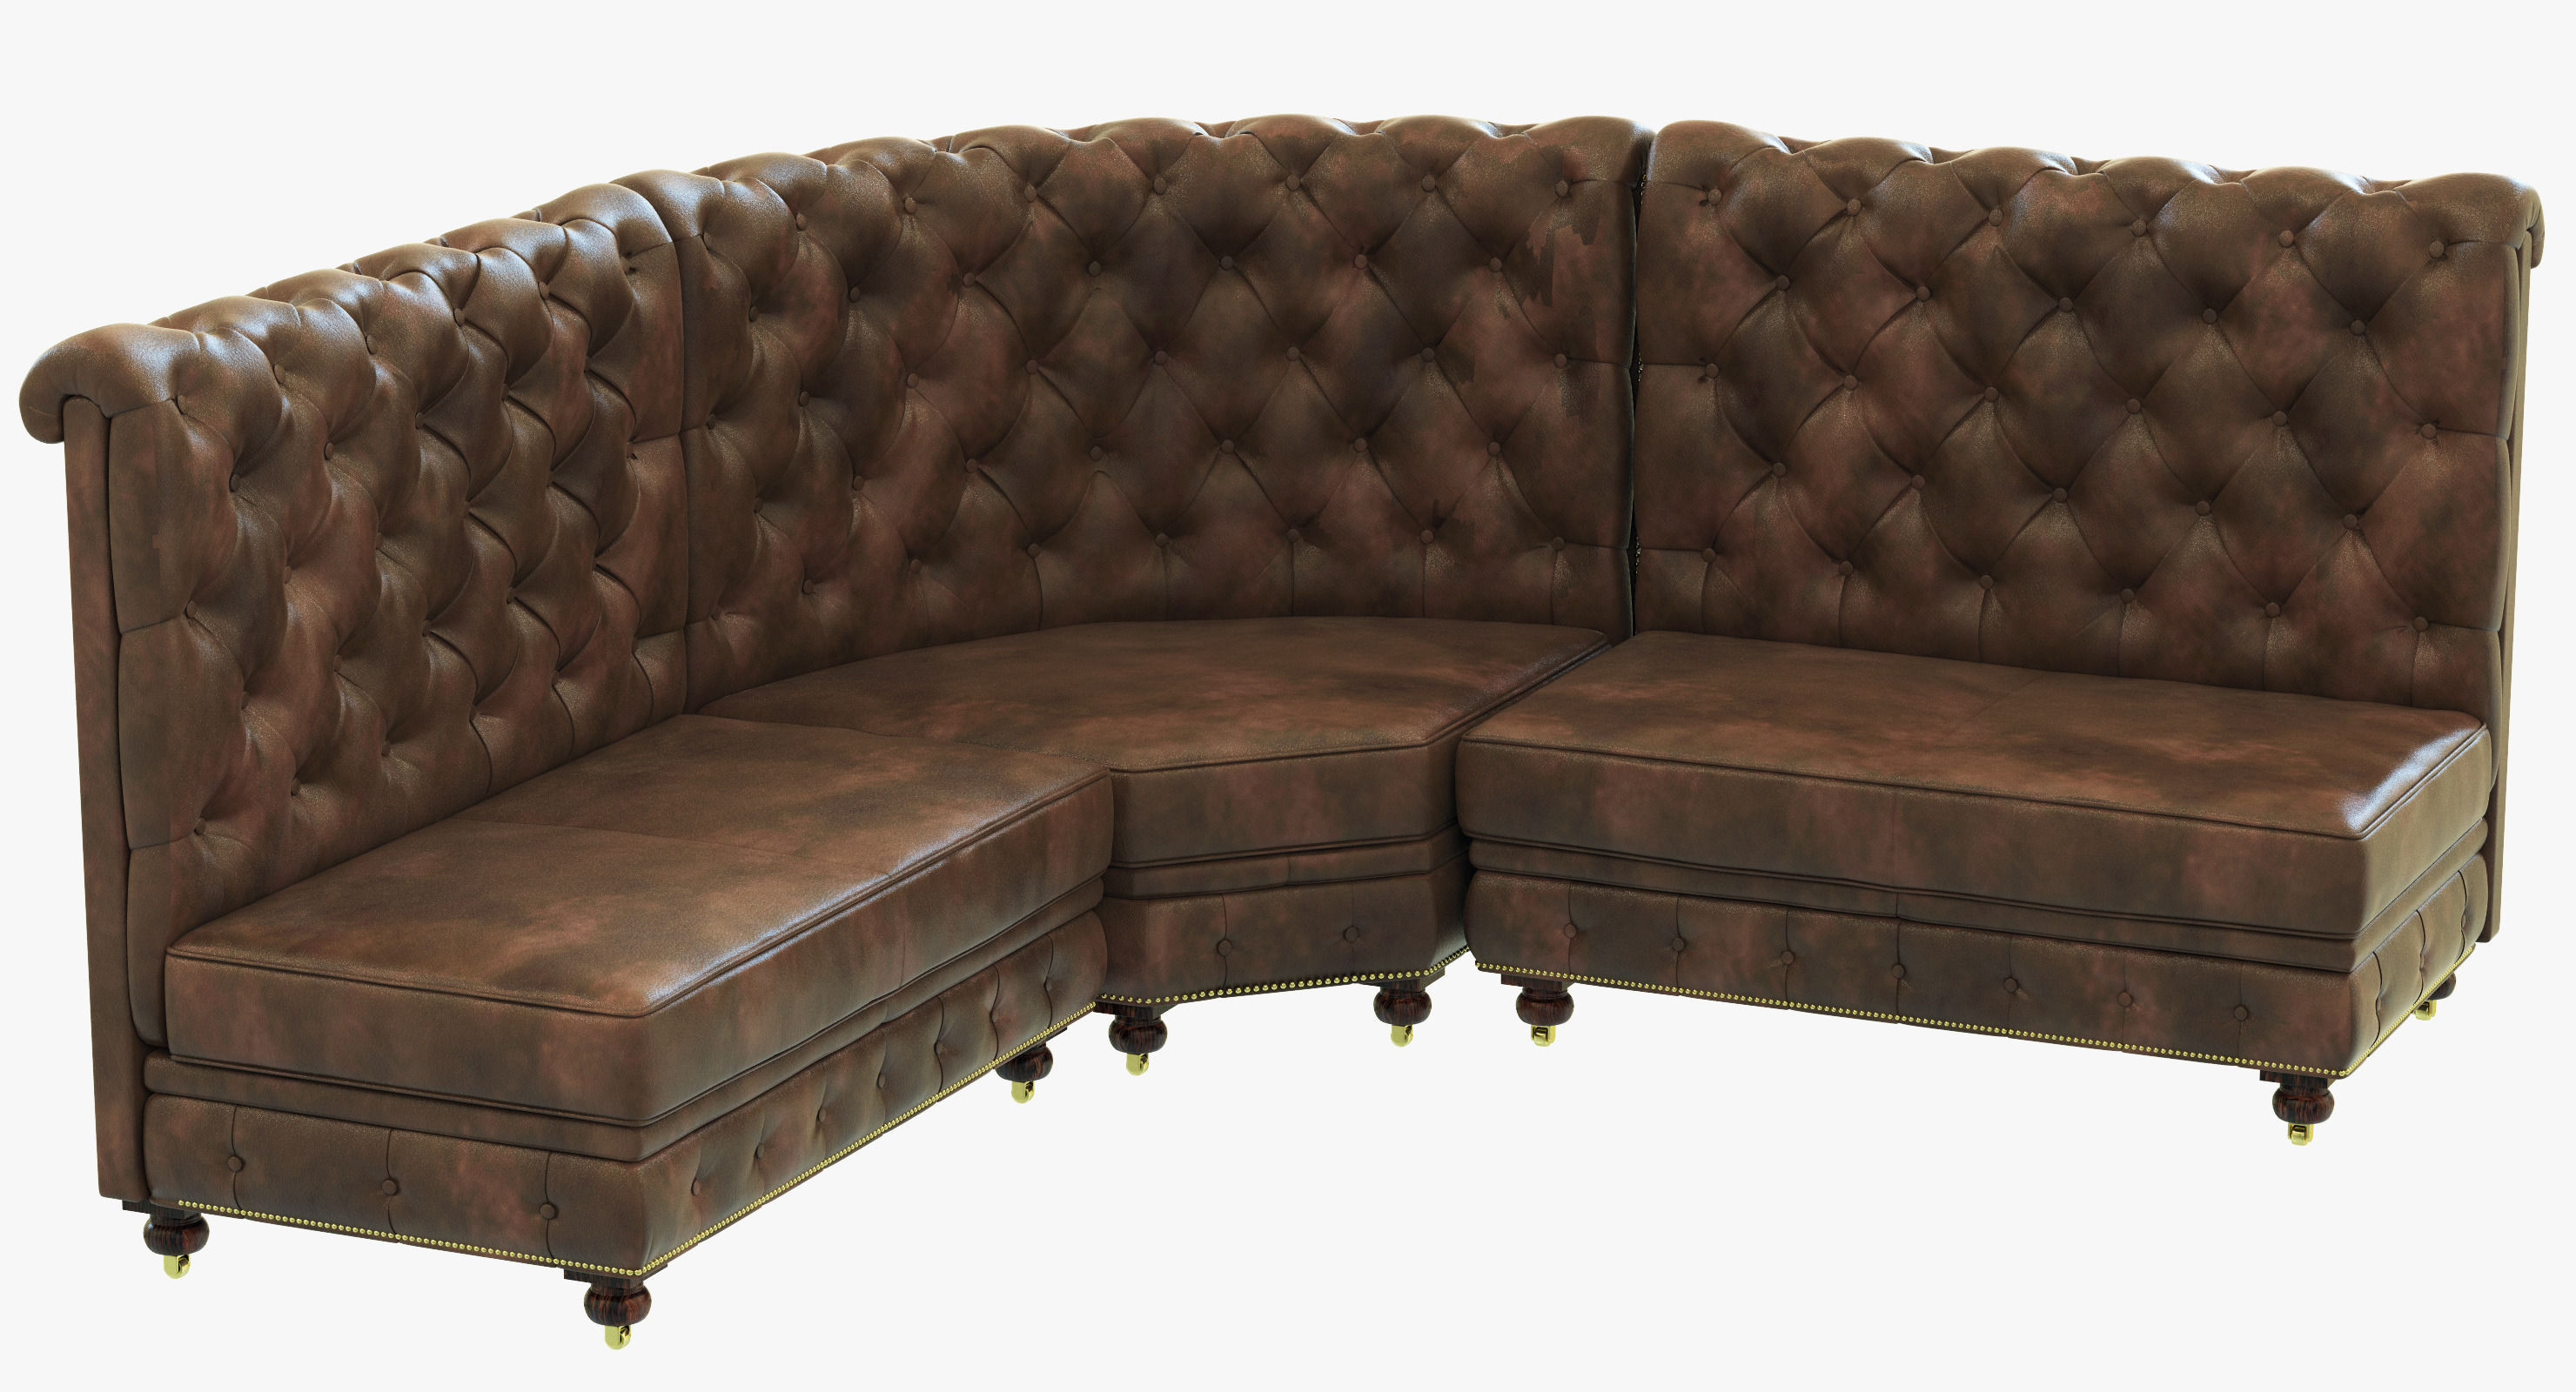 kensington leather chair wicker living room restoration hardware l banquette 3d